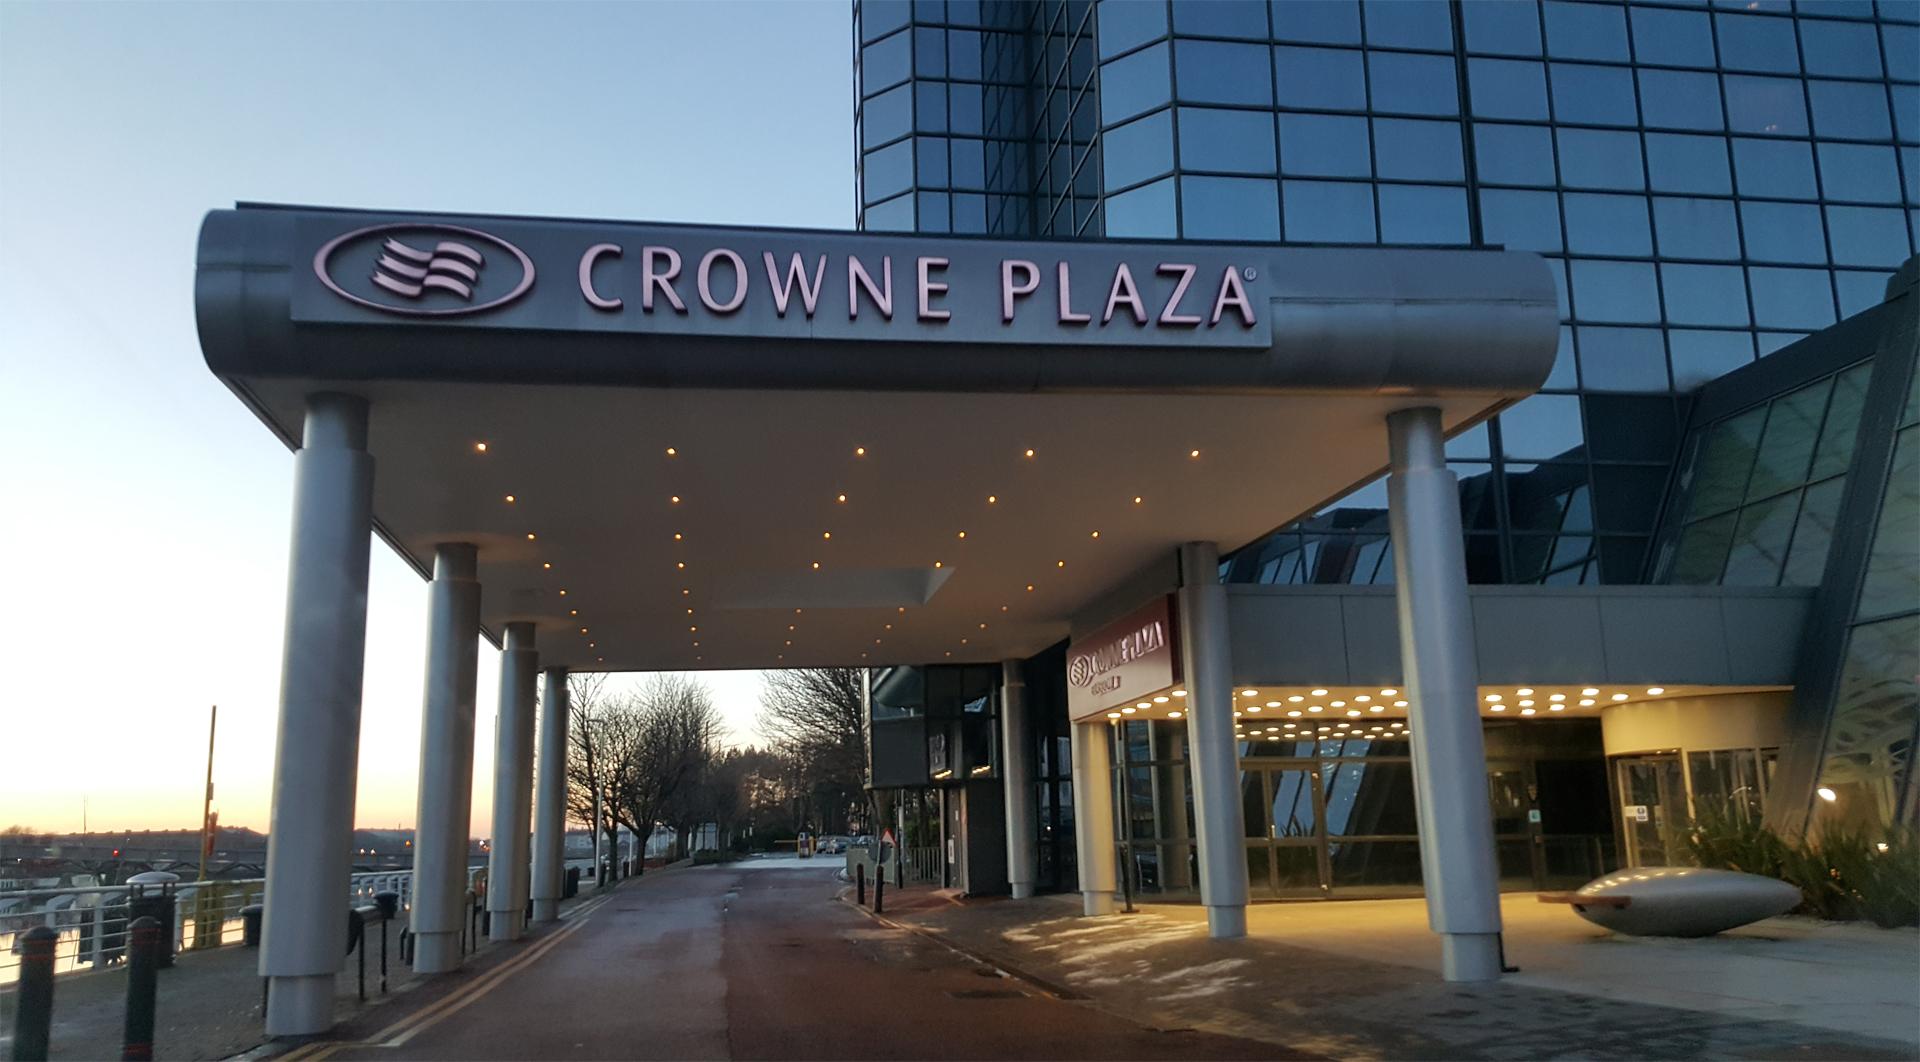 Crowne Plaza Glasgow hotel entrance